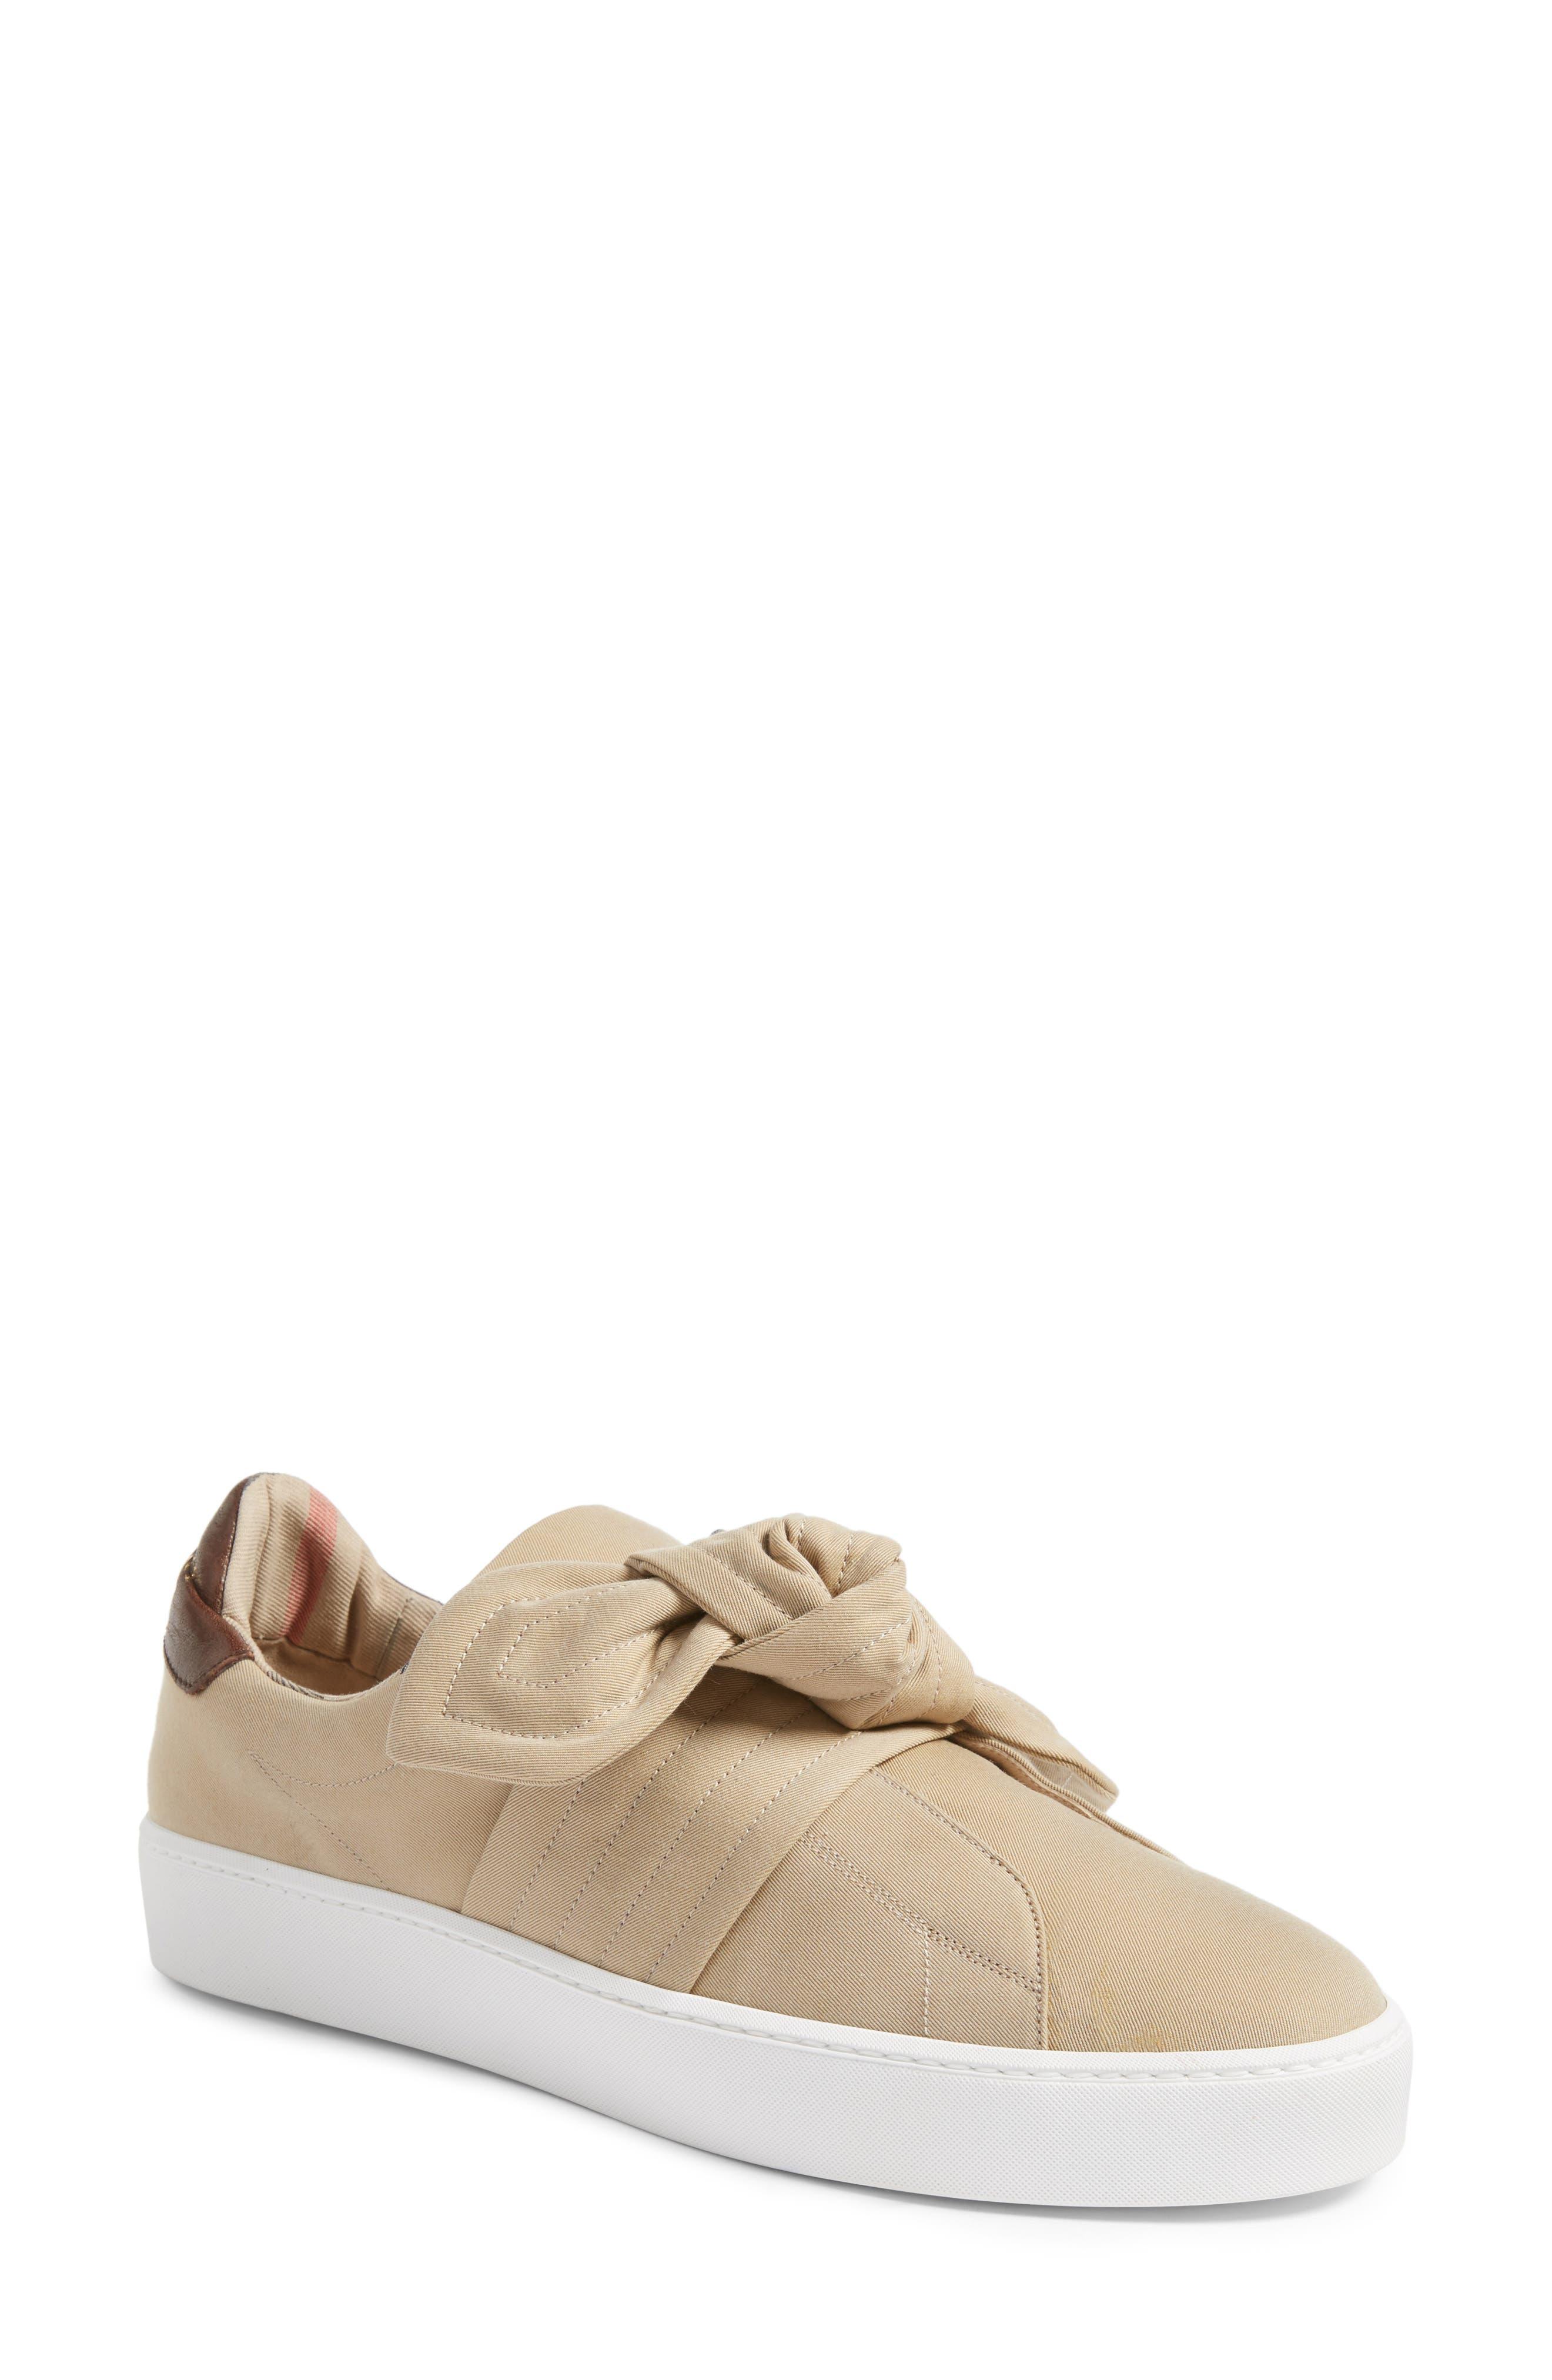 Burberry Knot Leather Sneaker (Women)